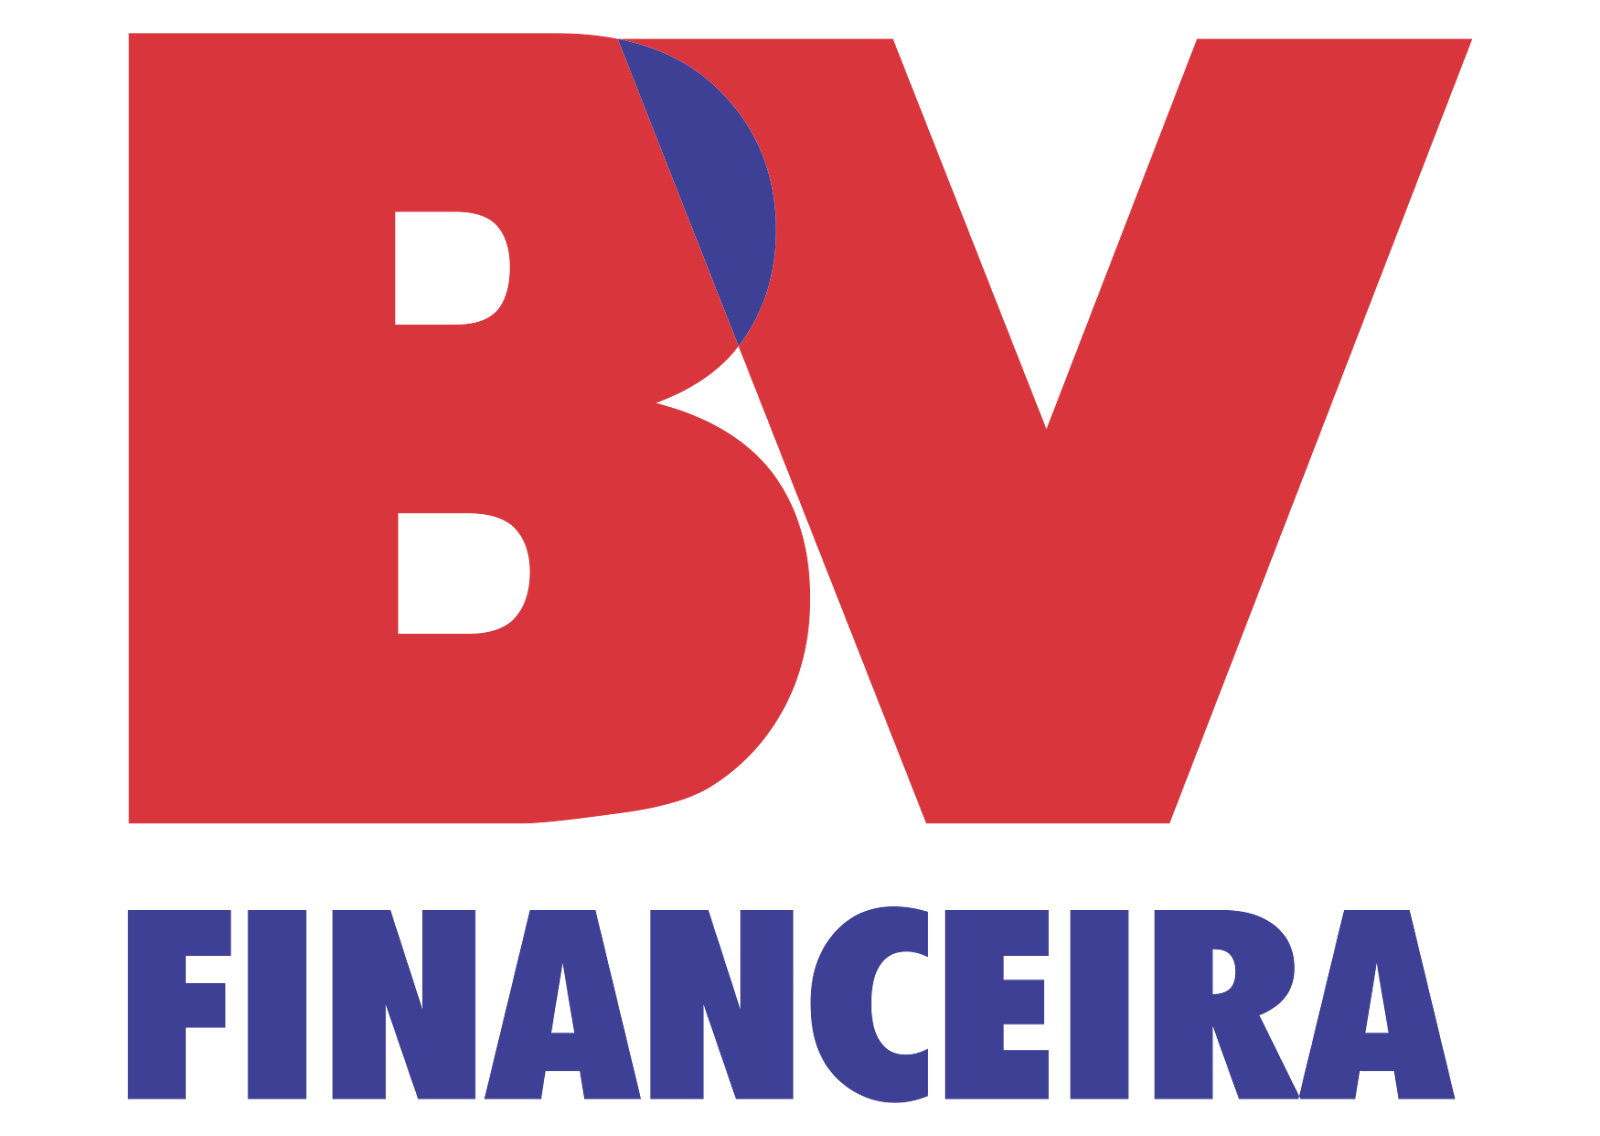 Bv financeira logo vector format cdr ai eps svg pdf png